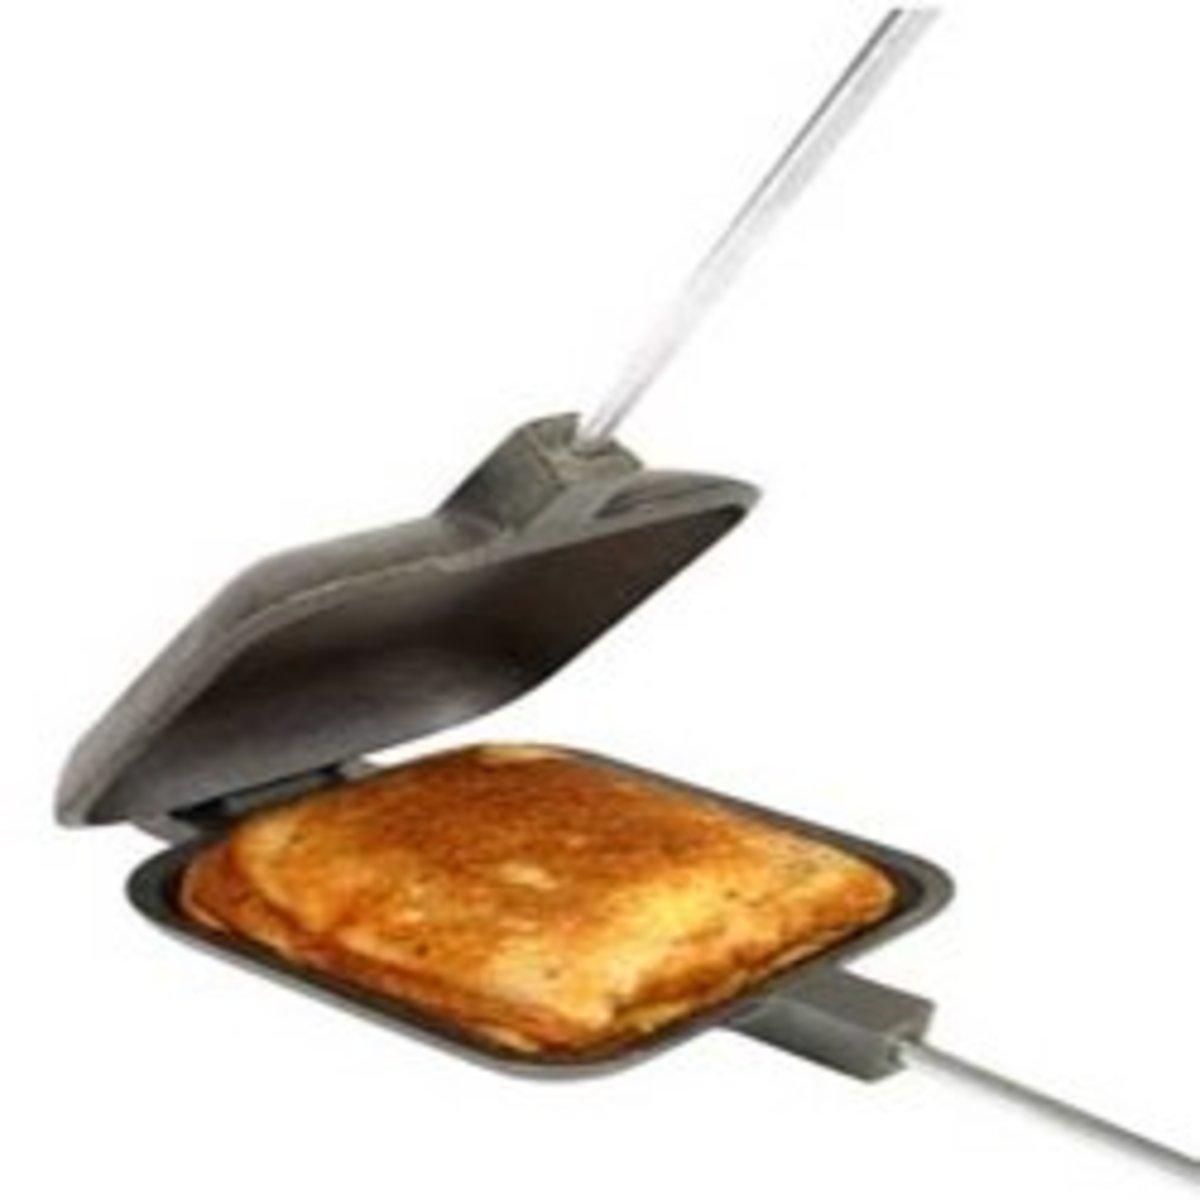 Pie iron